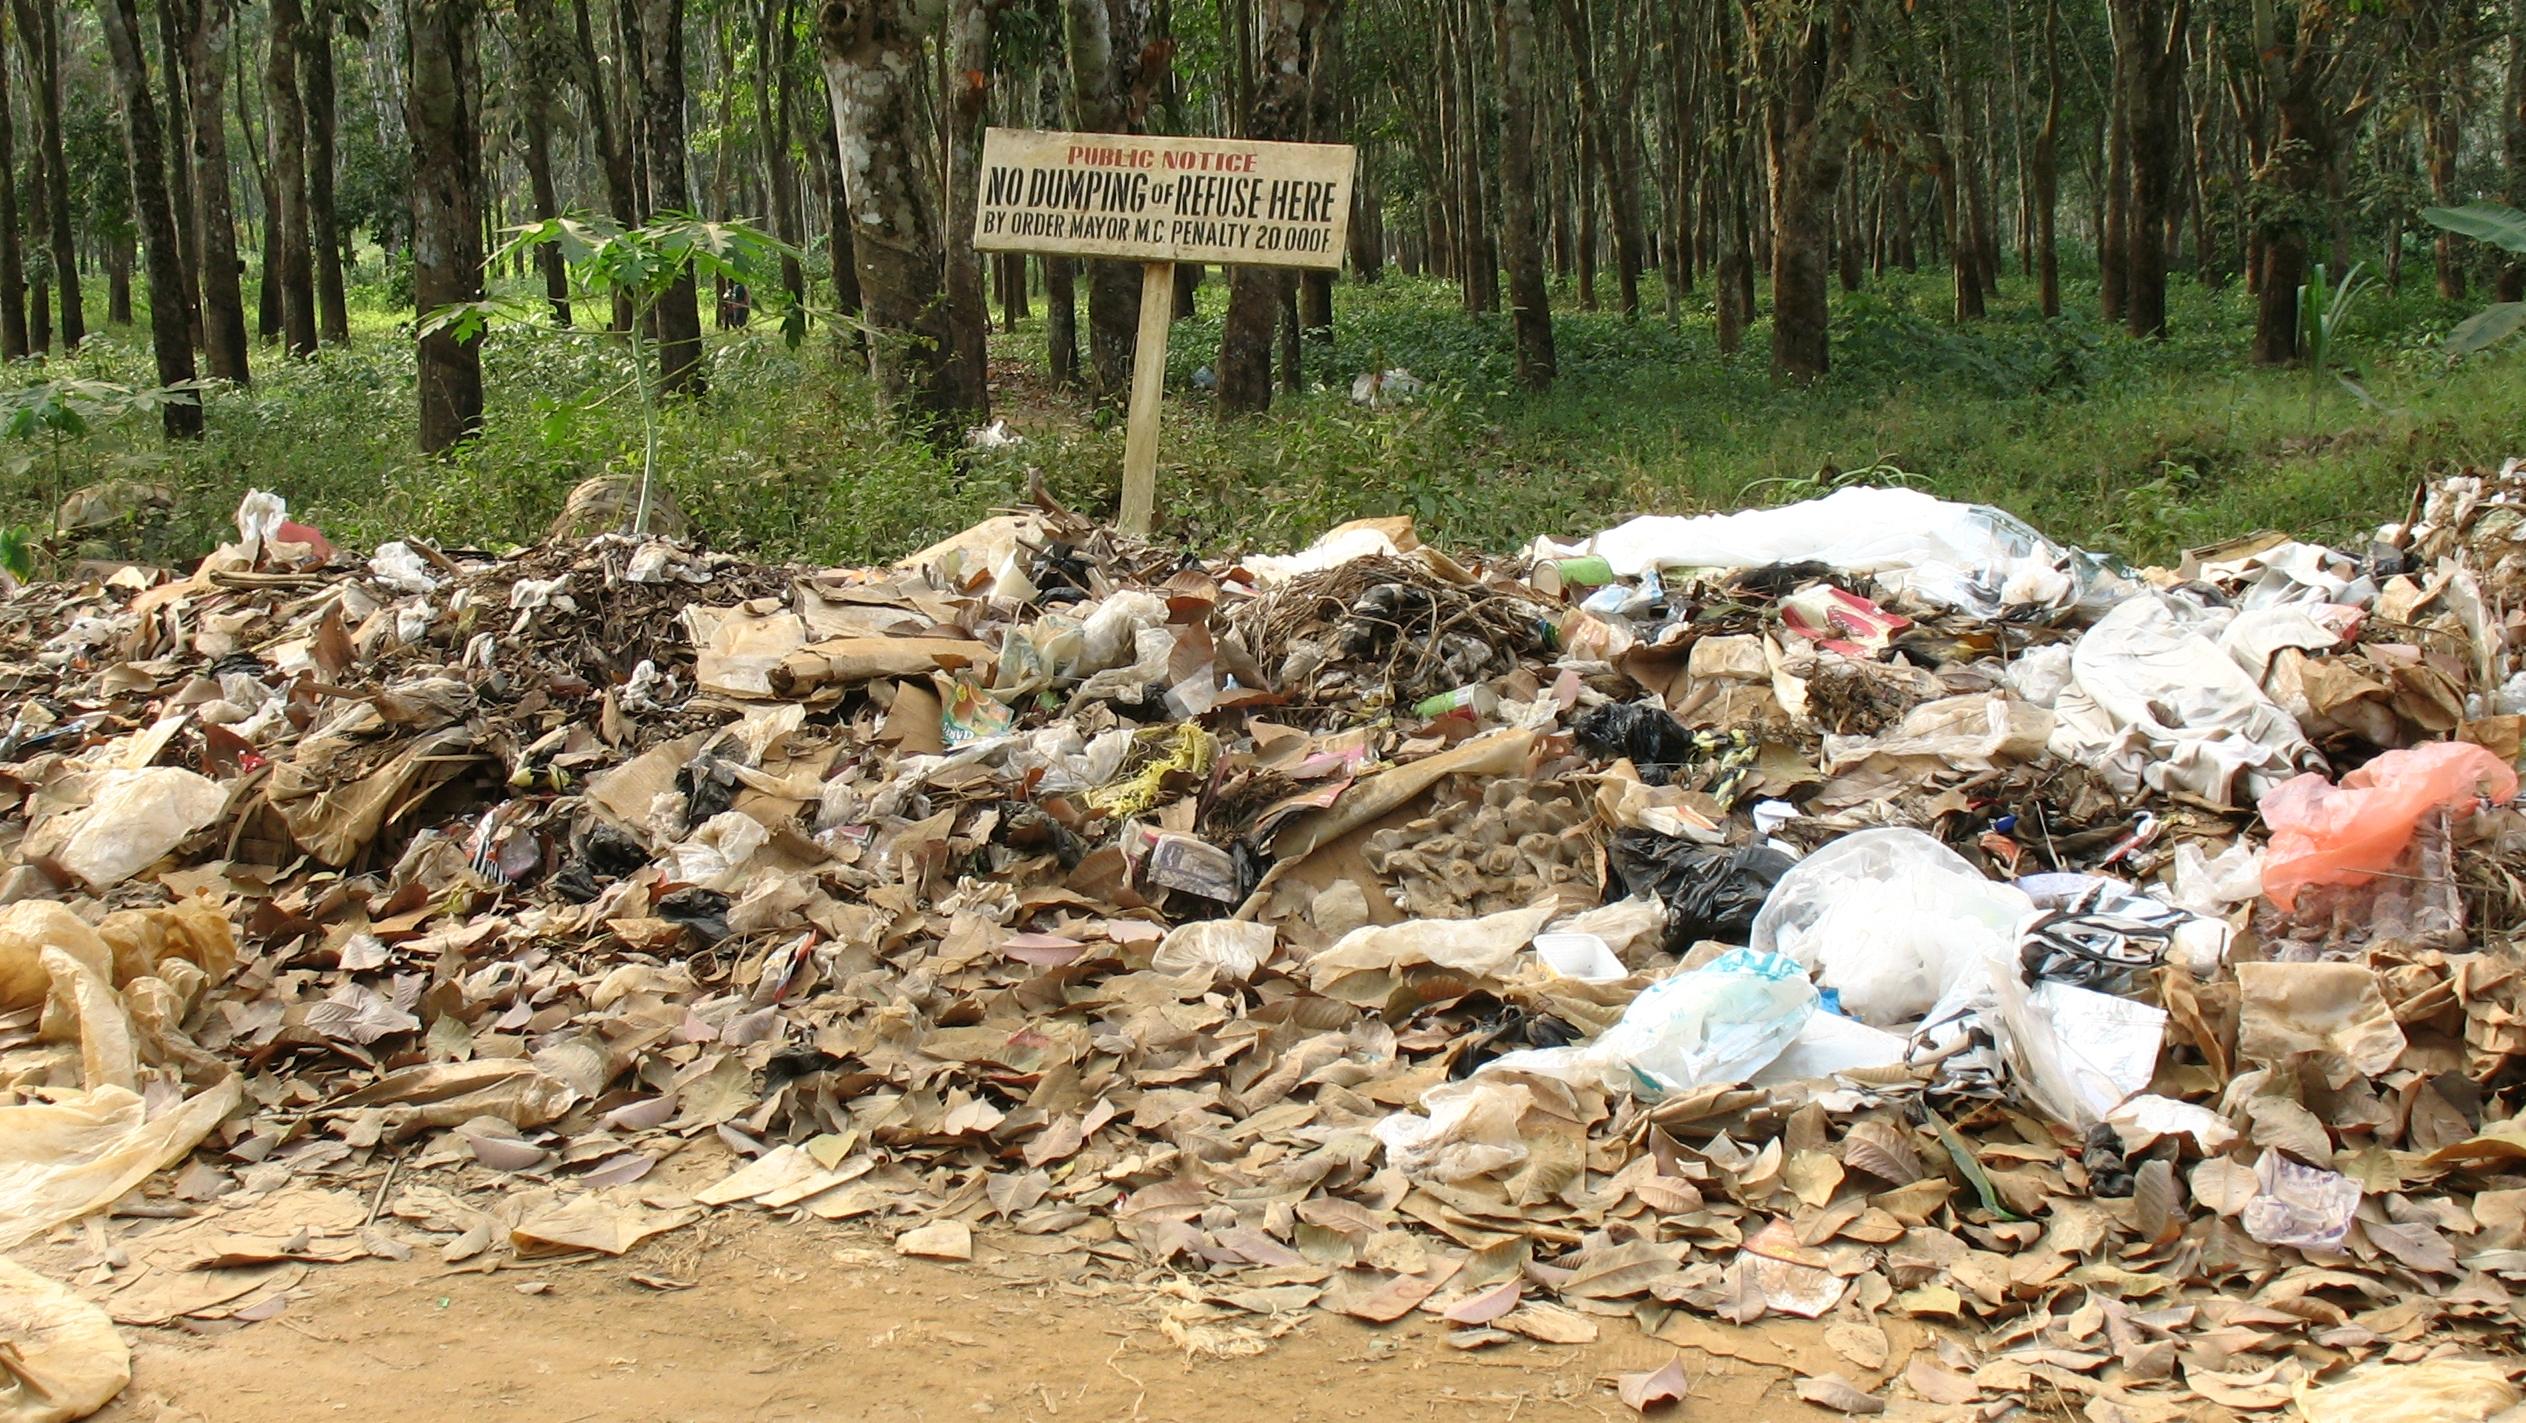 Waste land documentary essay